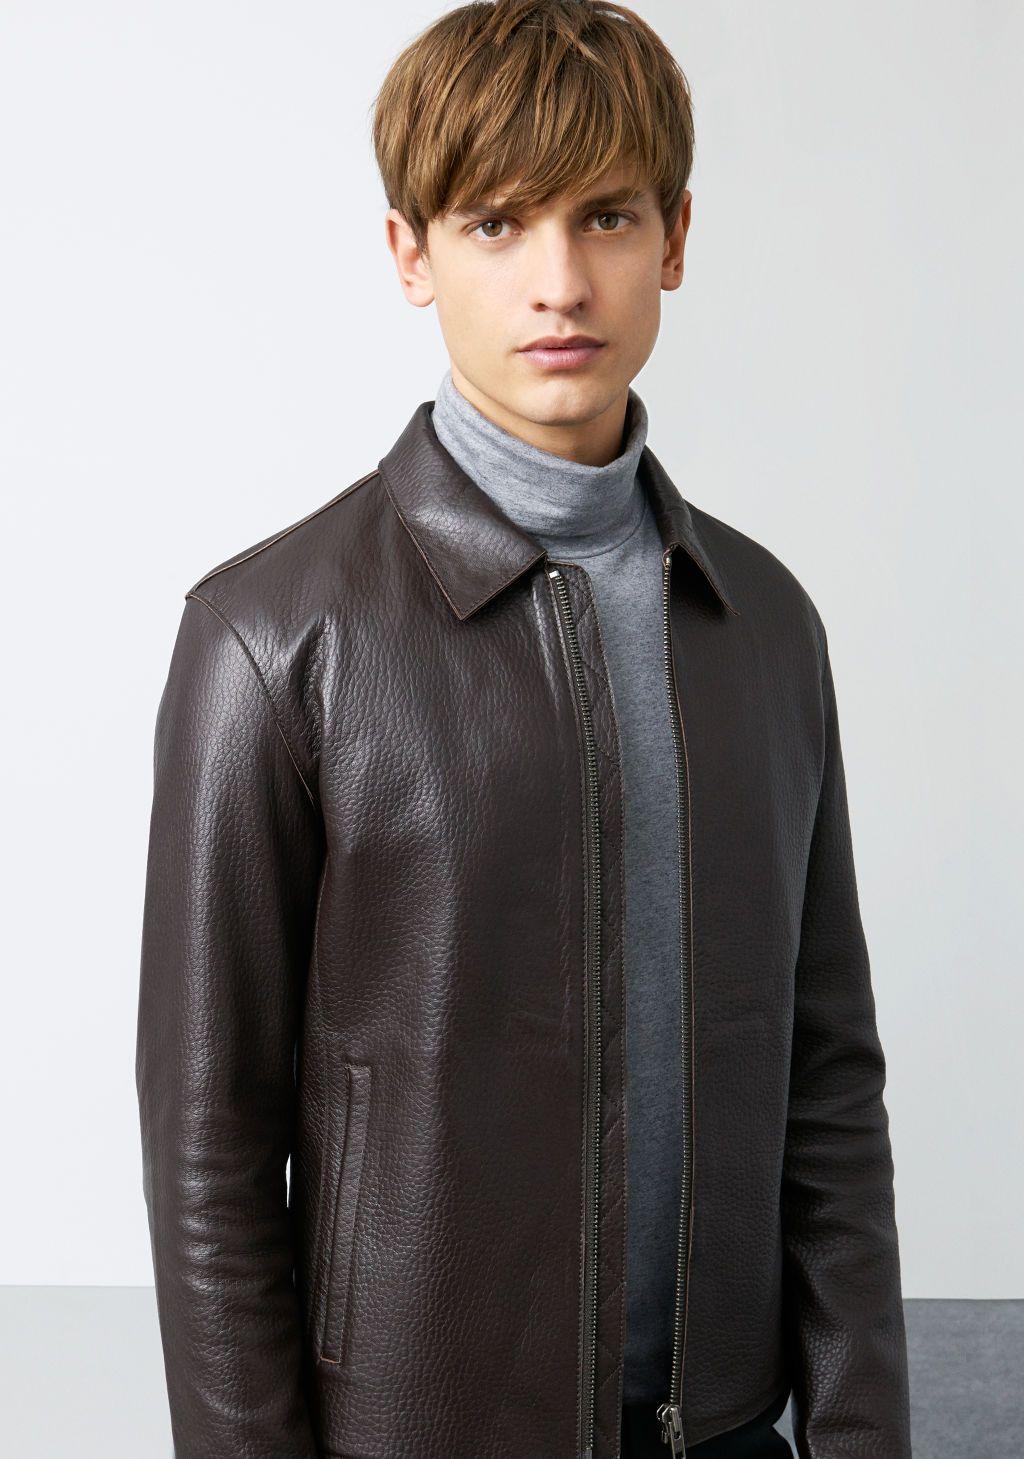 ZARA Man Lookbook November Leather jacket and